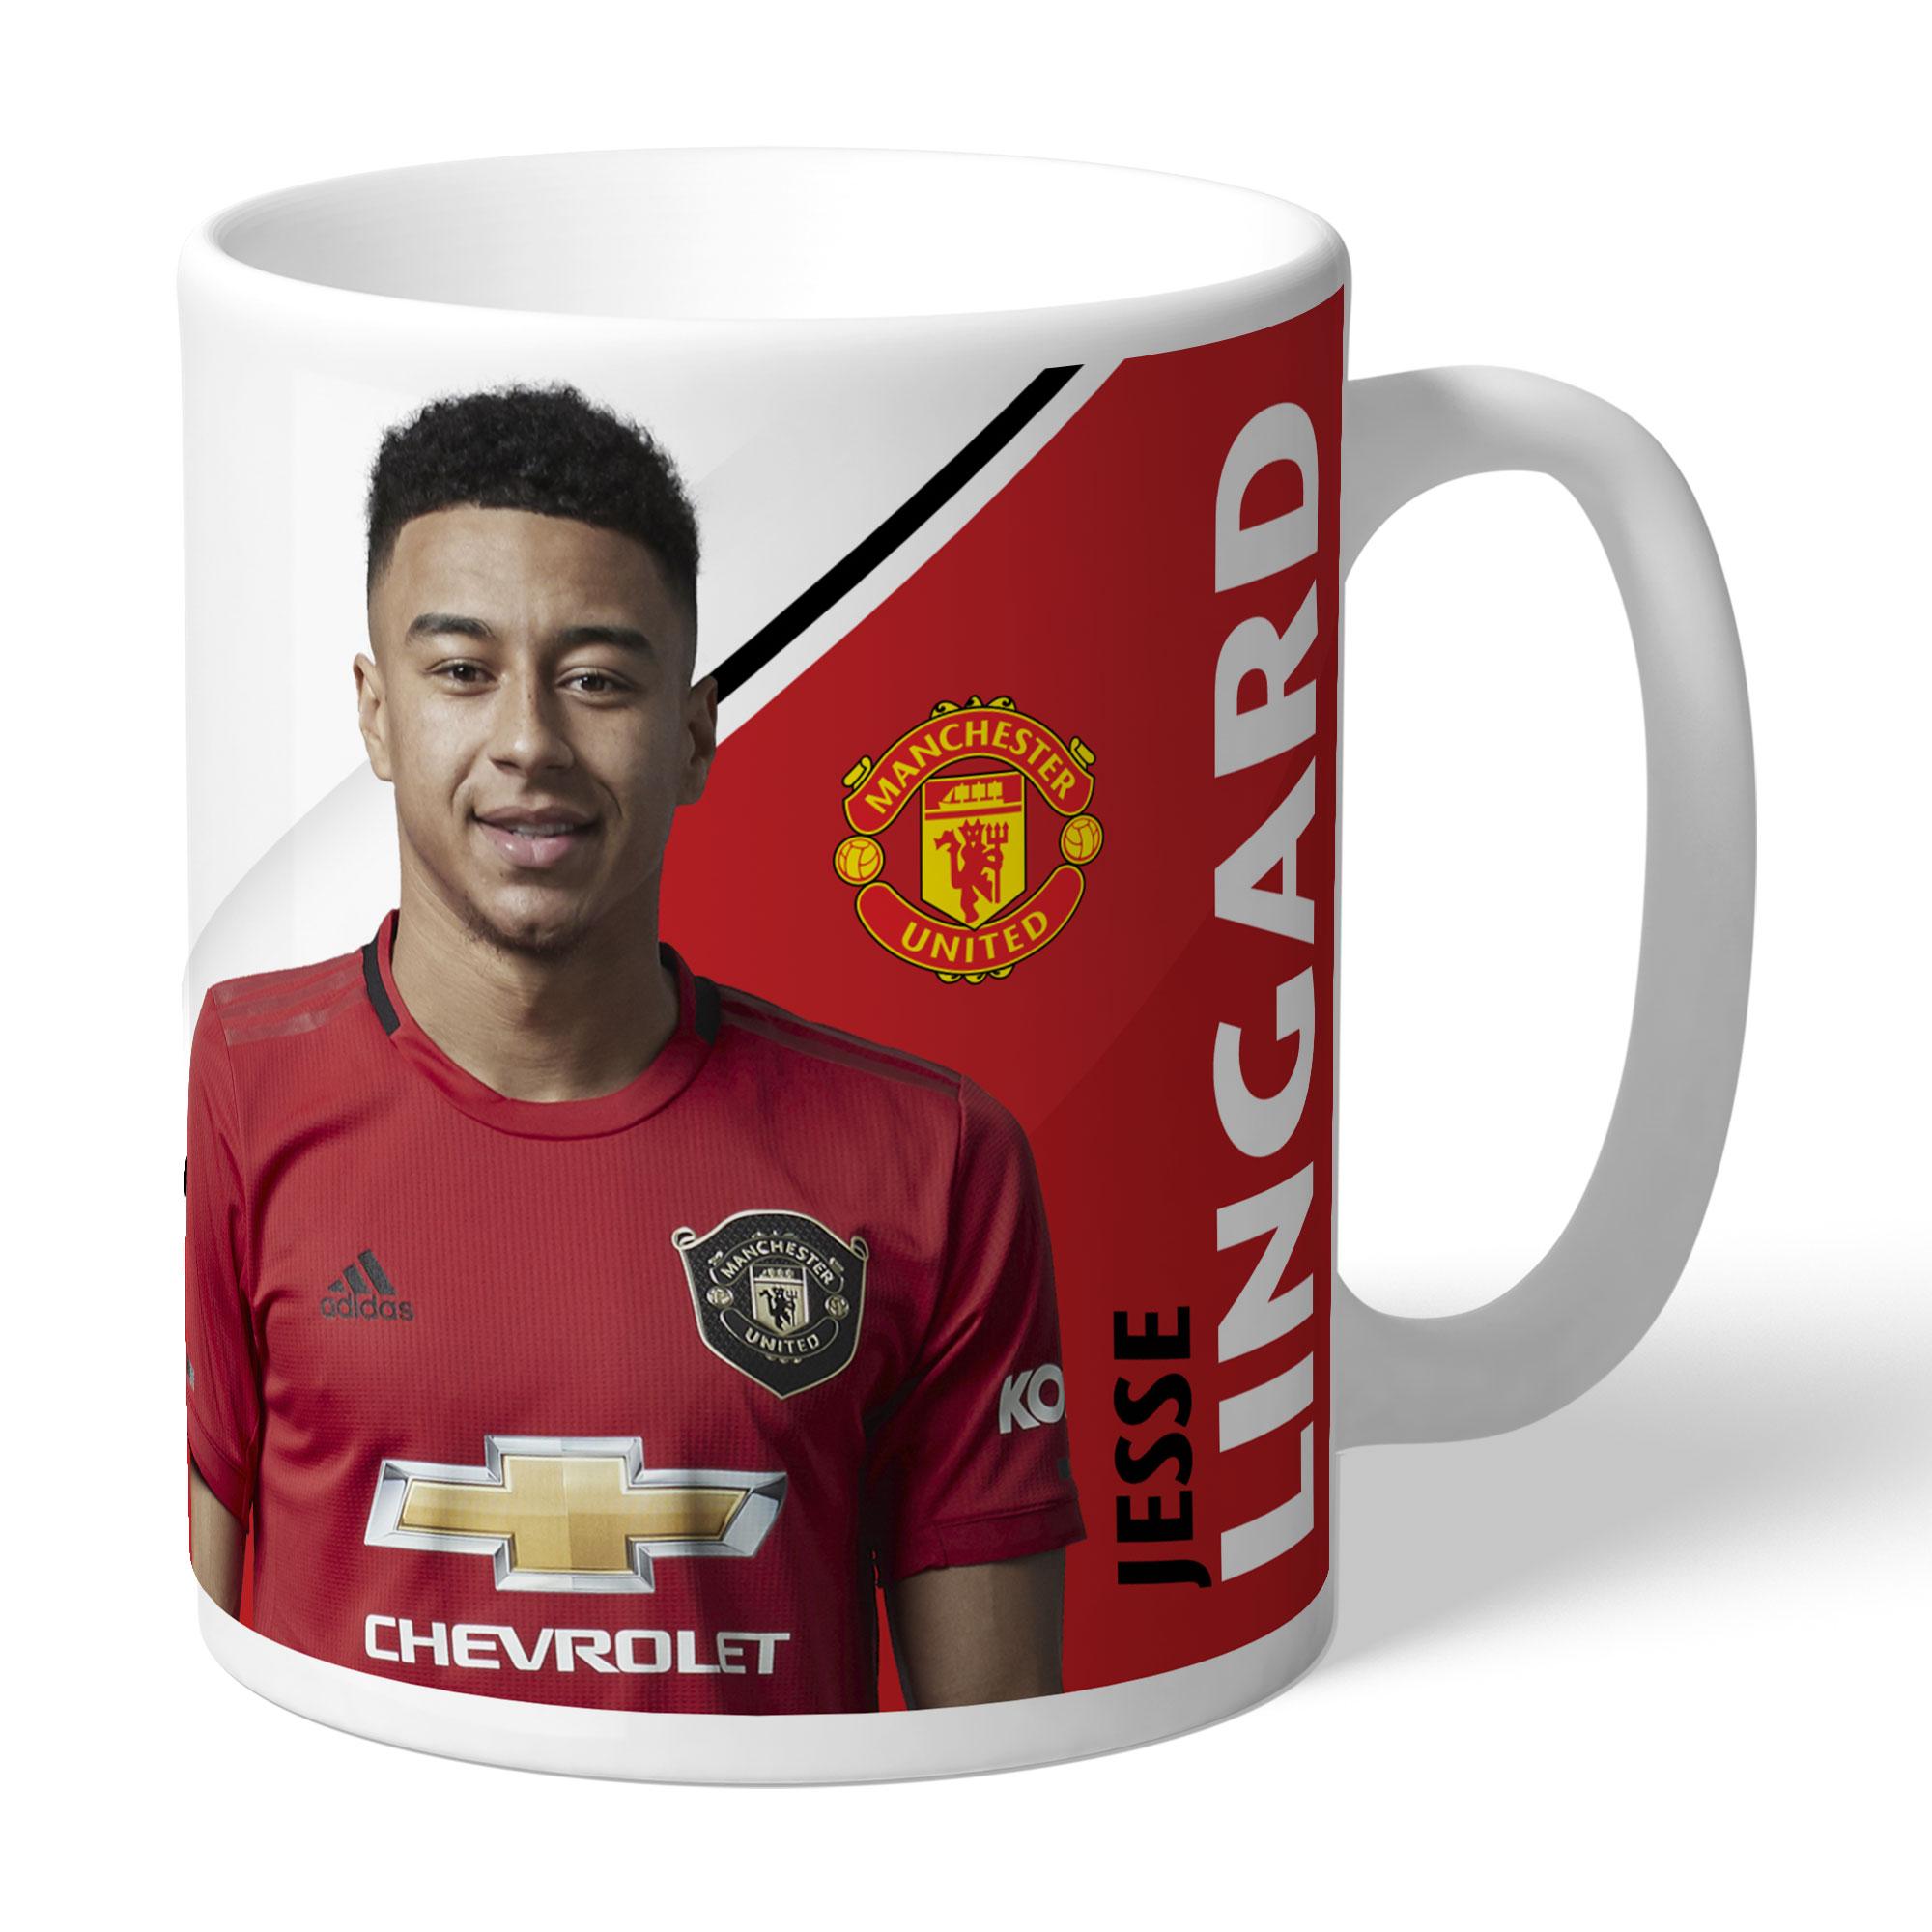 Manchester United FC Lingard Autograph Mug